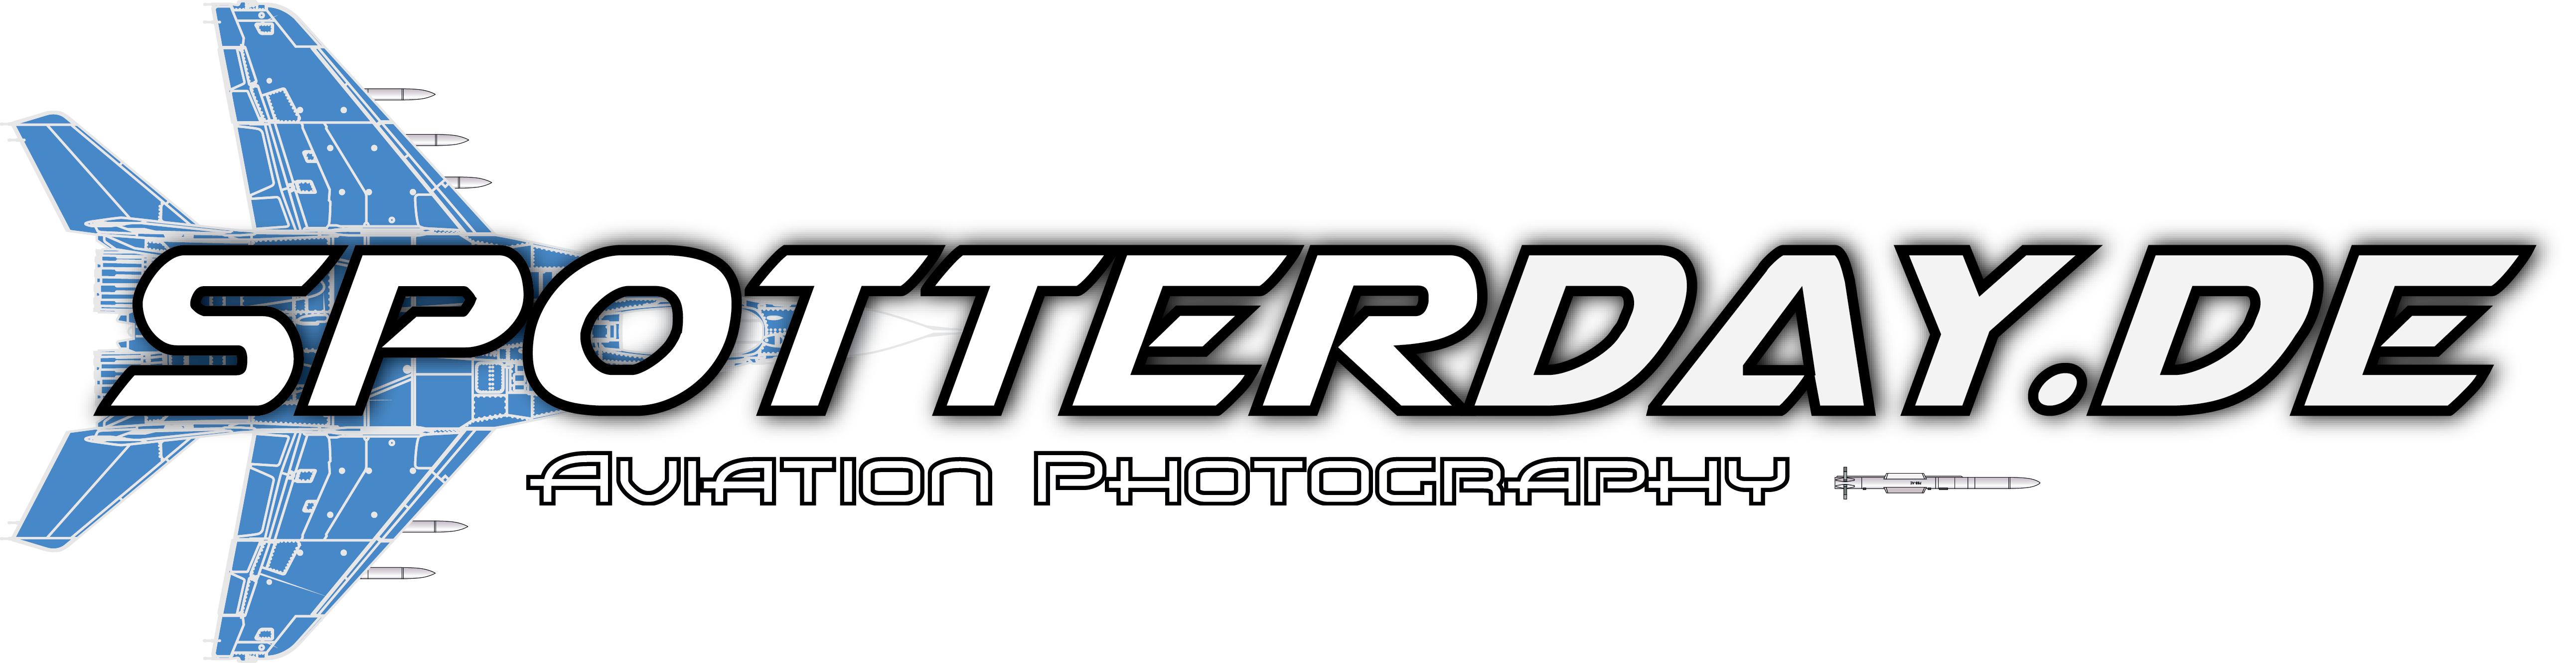 Spotterday_Web_2